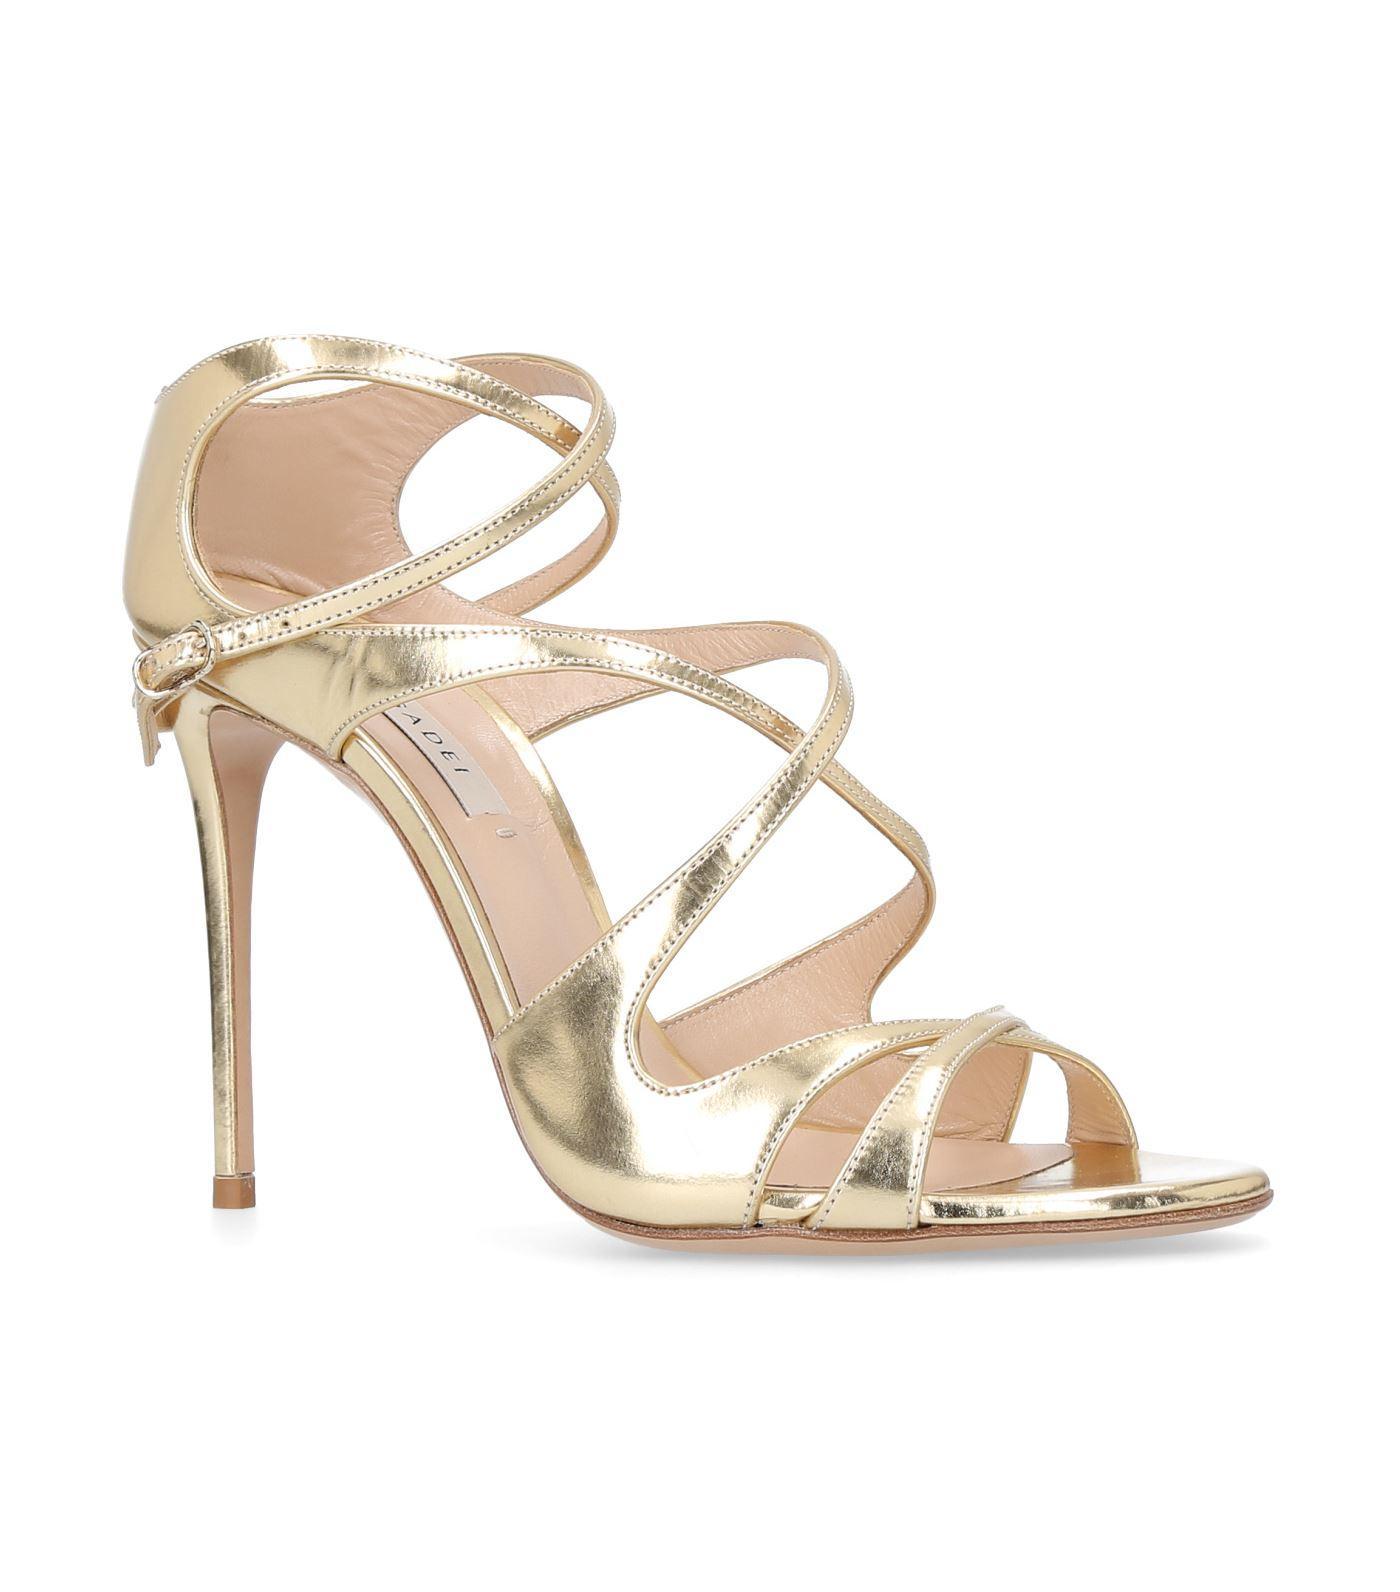 Casadei Strappy Metallic Sandals In Gold